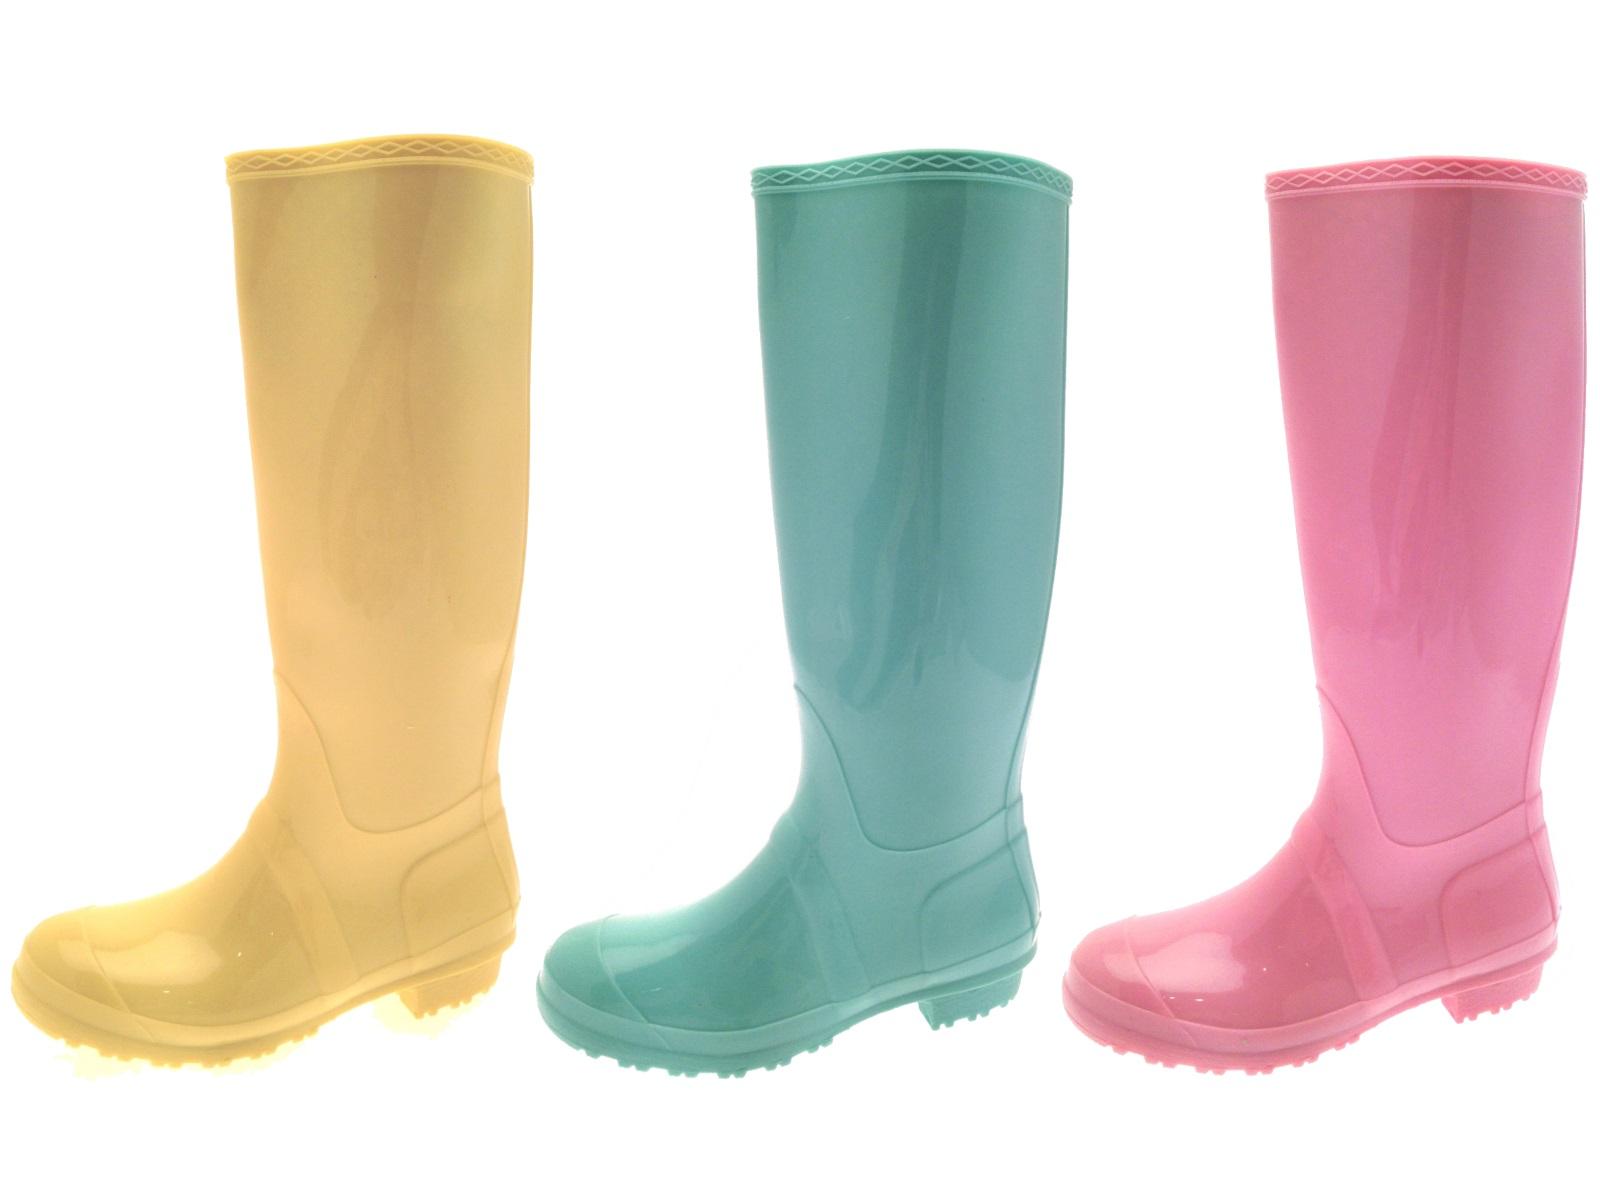 Popular WOMENS LADIES FLAT FESTIVAL WELLIES WELLINGTON KNEE HIGH RAIN BOOTS